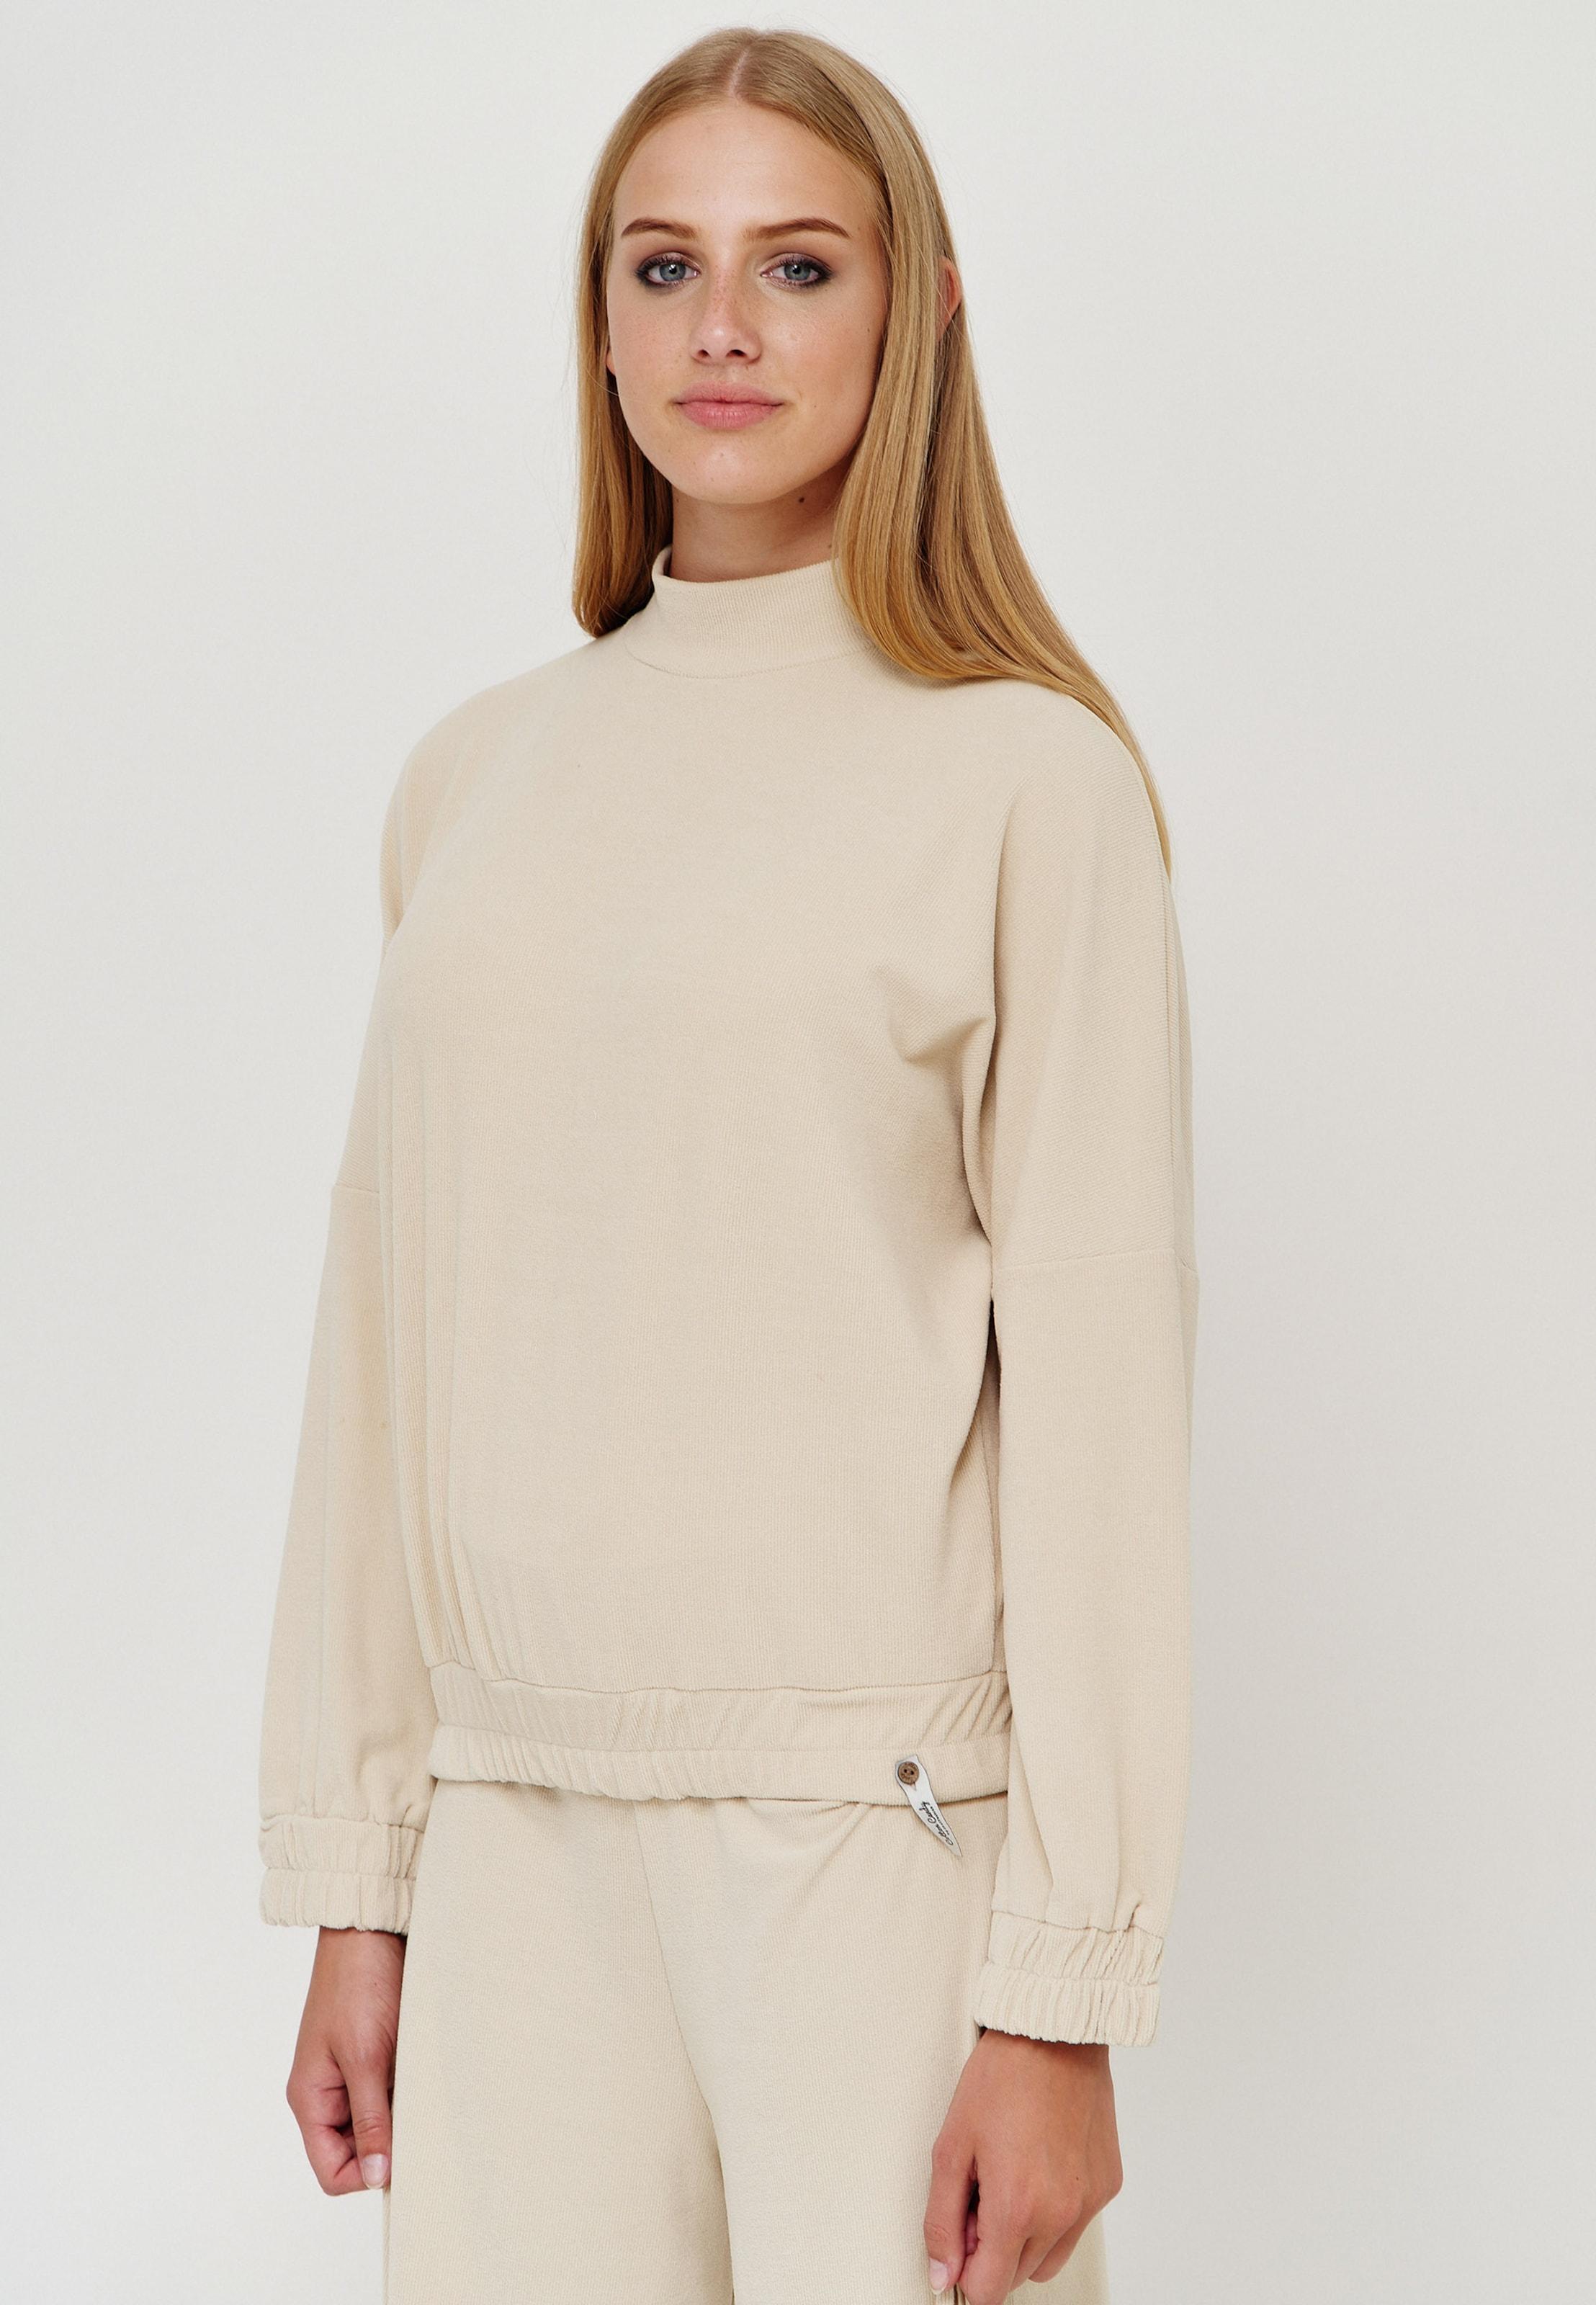 Cotton Candy Sweatshirt 'ROHANNA' in nude